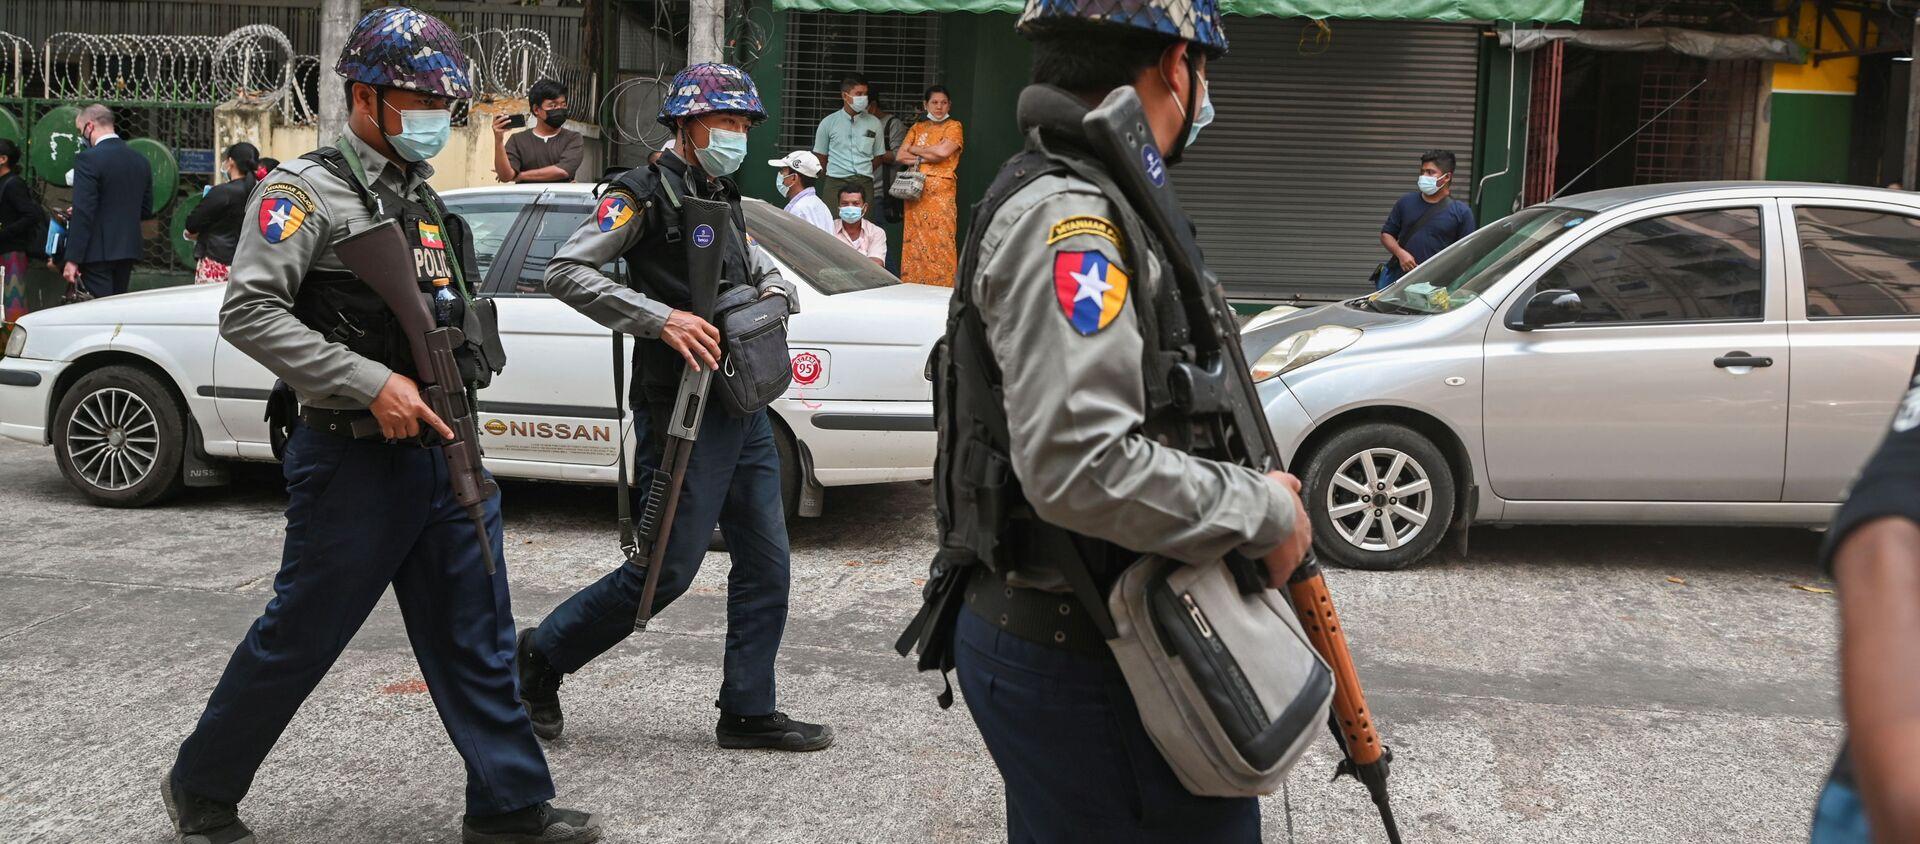 Cảnh sát trên phố Yangon, Myanmar. - Sputnik Việt Nam, 1920, 10.04.2021